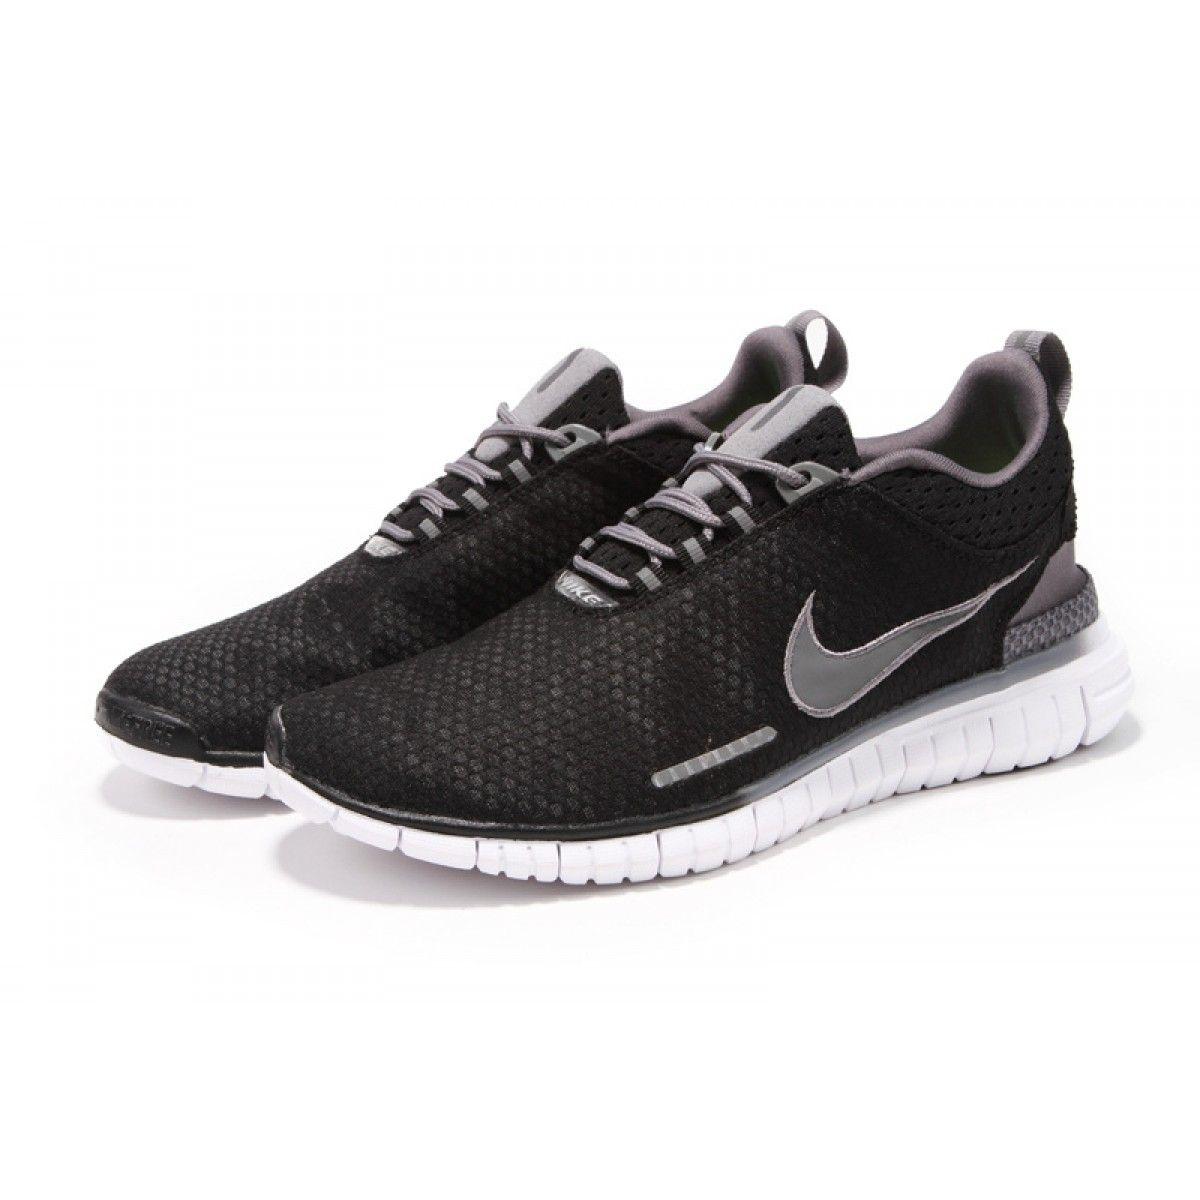 6db77ecdb4e Nike Free OG Breathe Running Shoes Black Grey